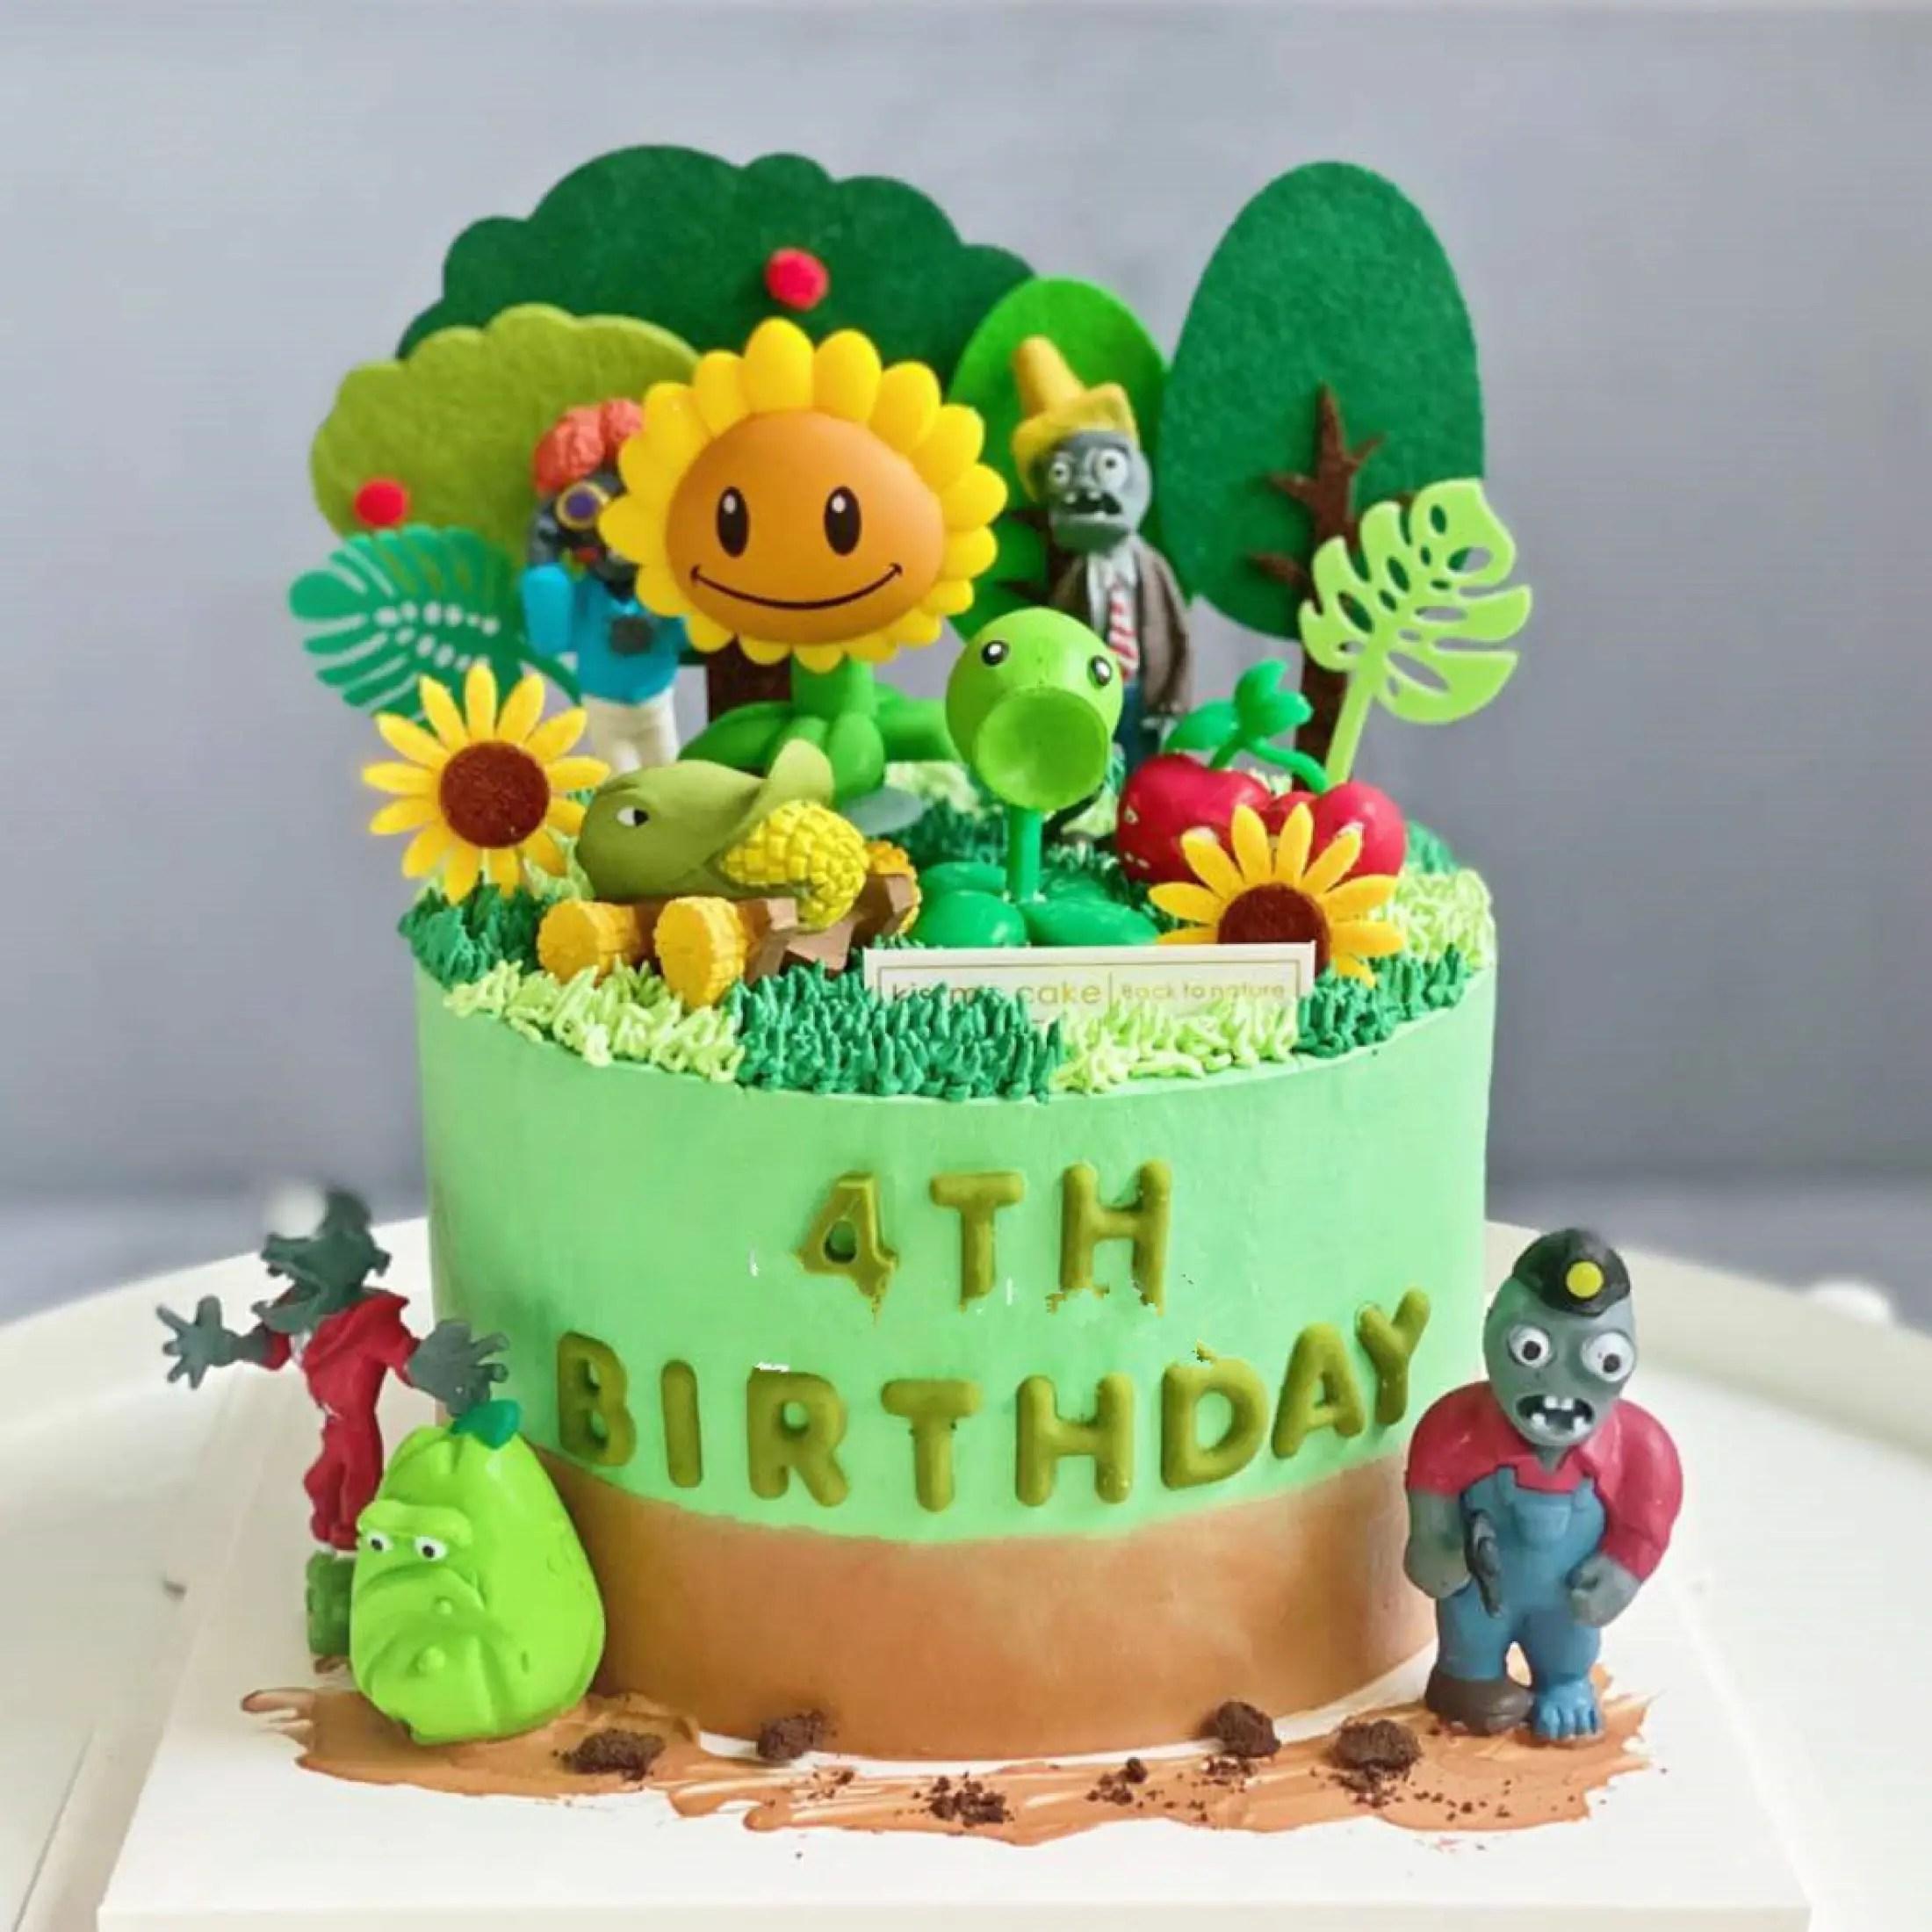 Tm 1 Set 8 Pcs Fun Plant Fight Zombie Theme Green Resin Birthday Cake Topper Creative Personality Festival Children Birthday Party Decoration Lazada Ph